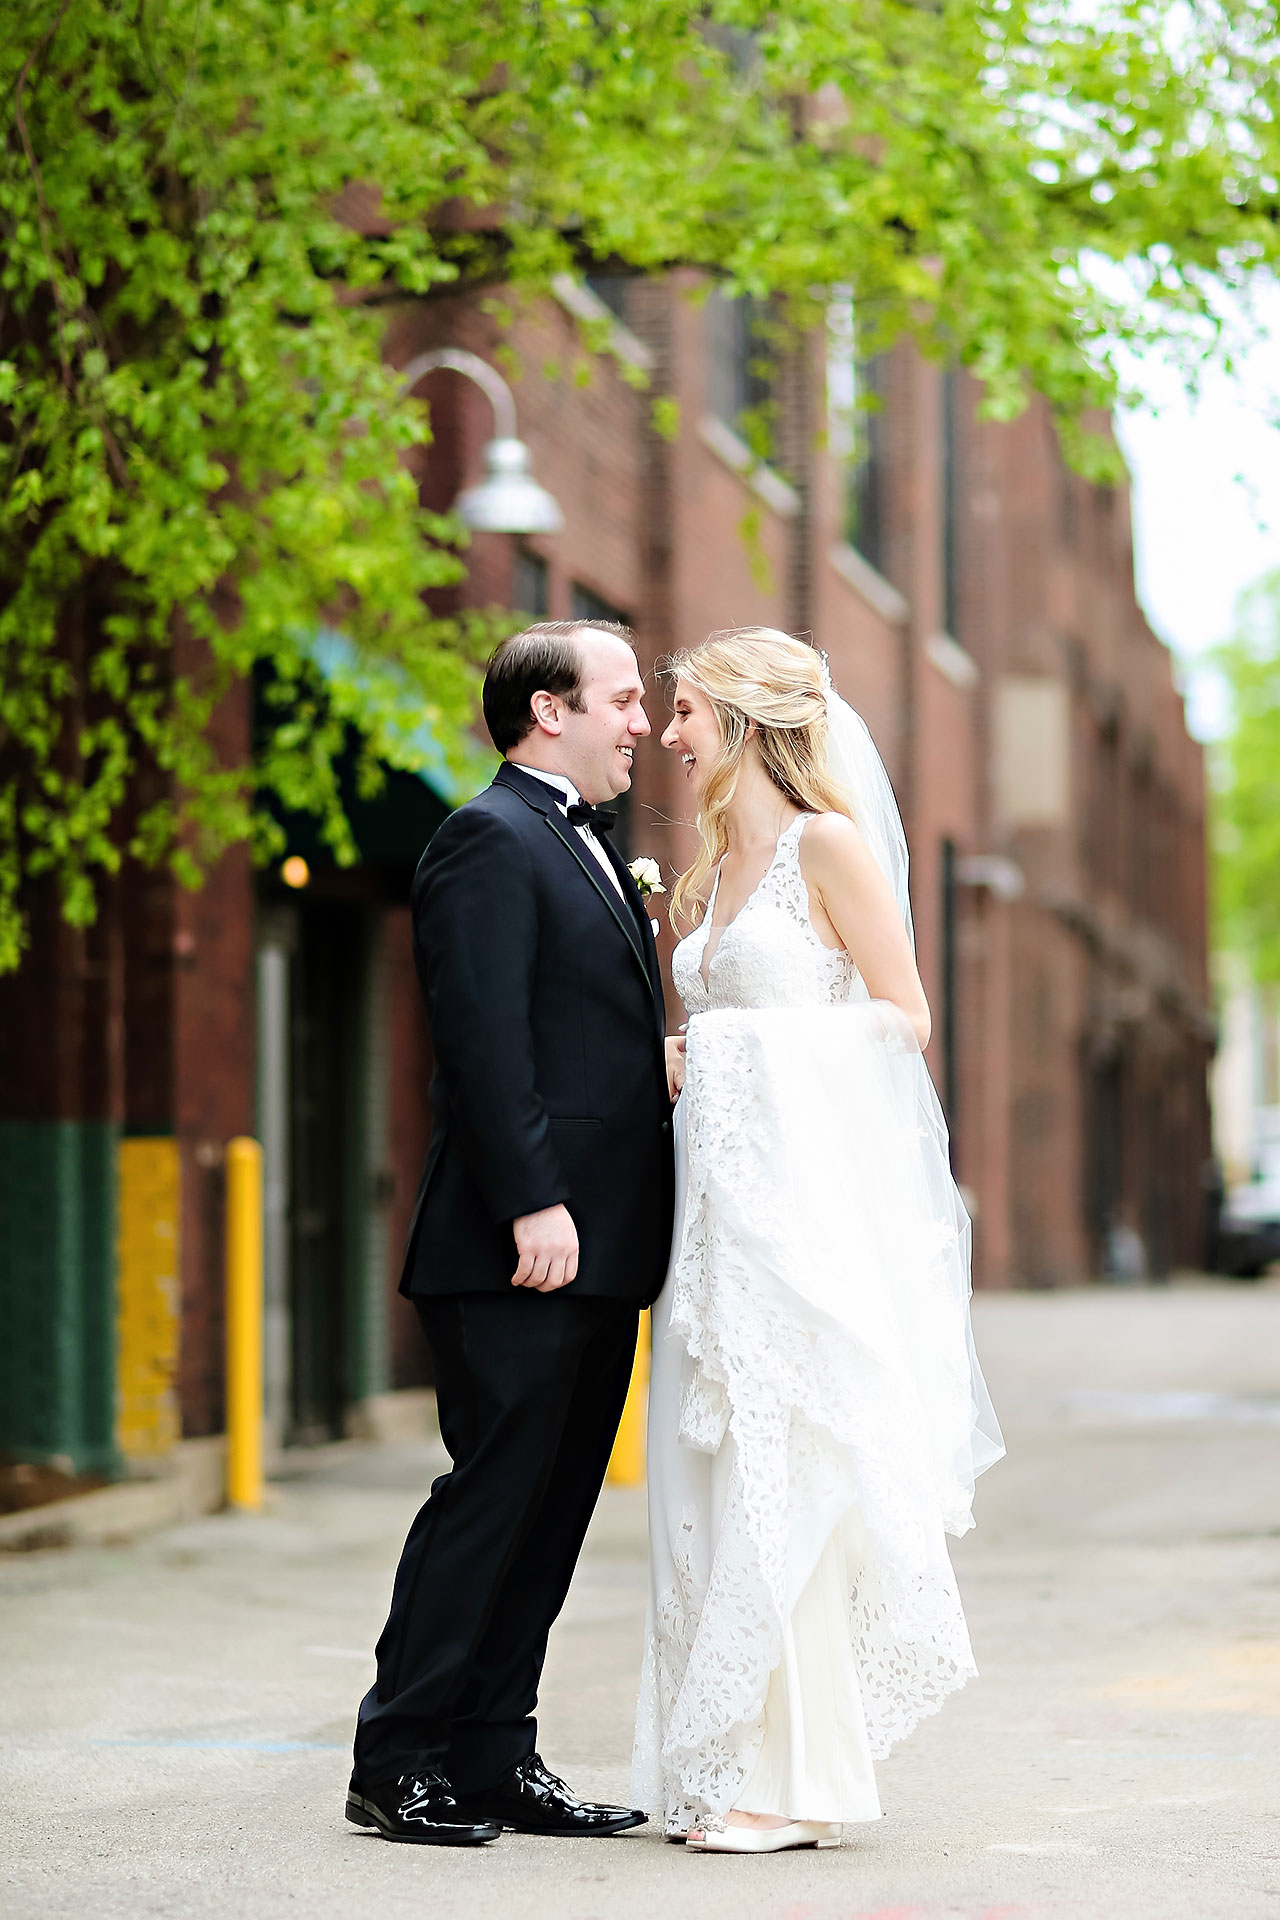 Allison Jeff Union Station Crowne Plaza Indianapolis wedding 159